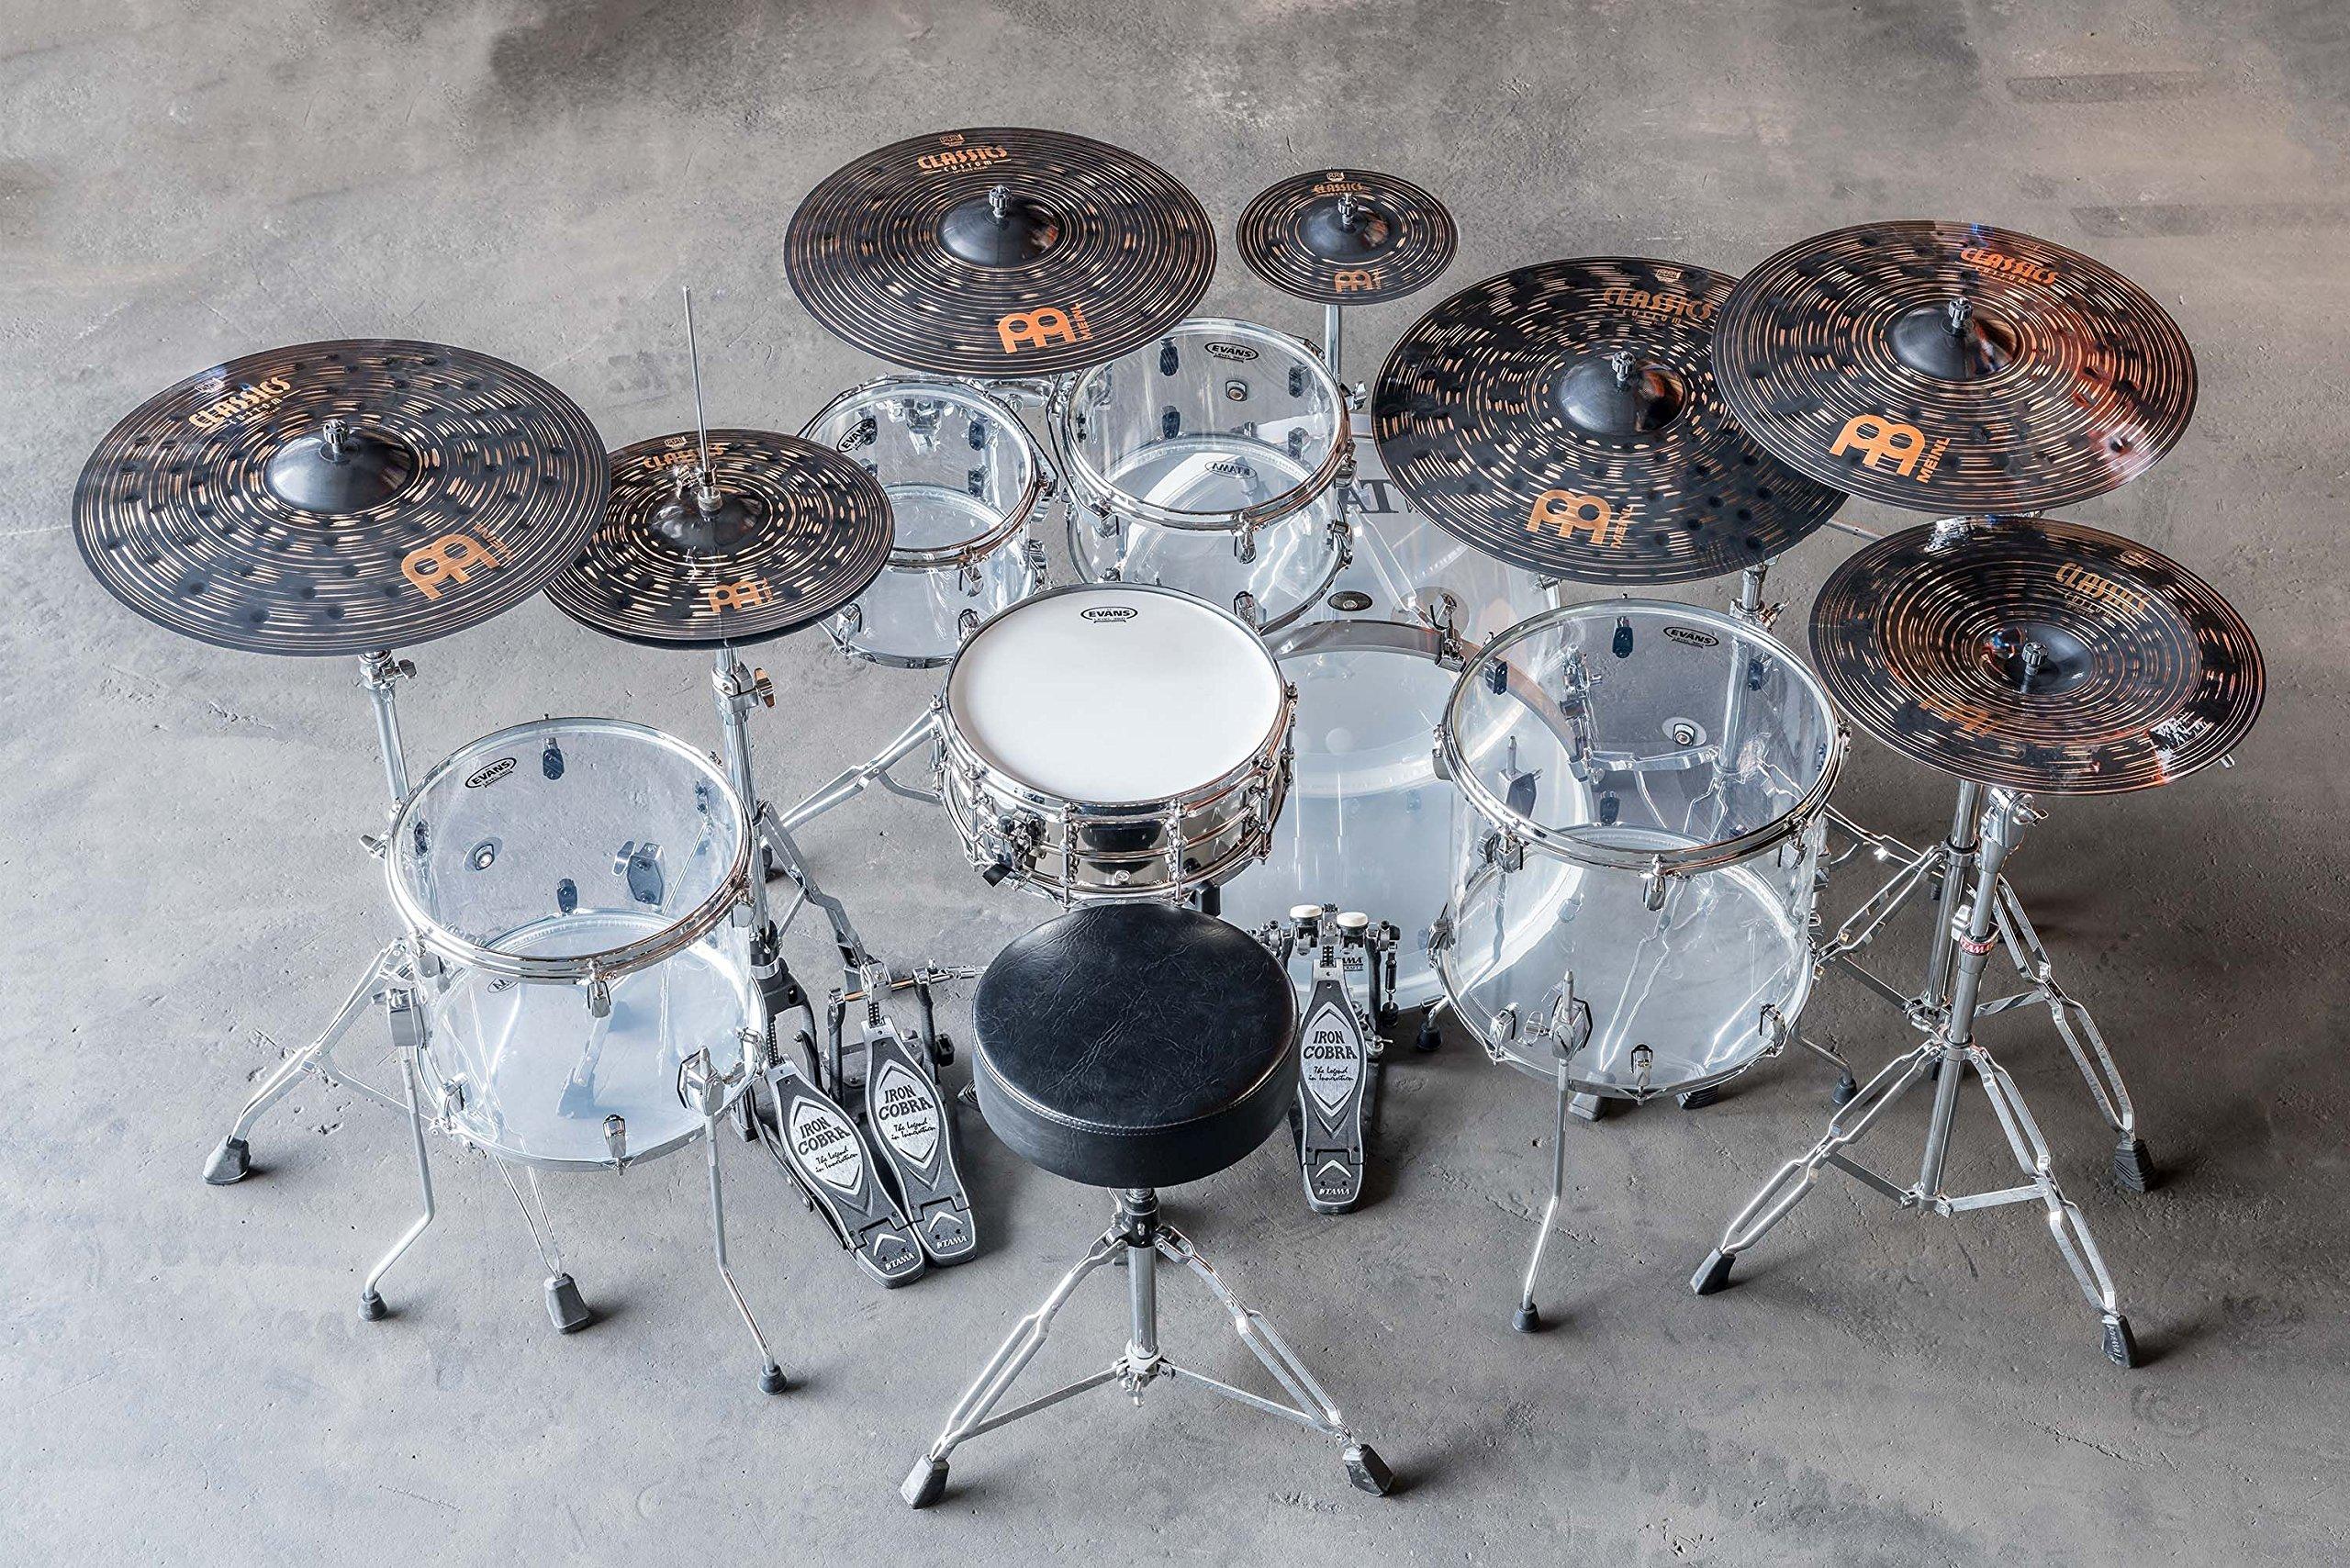 Meinl 14'' Hihat (Hi Hat) Cymbal Pair - Classics Custom Dark - Made in Germany, 2-YEAR WARRANTY (CC14DAH) by Meinl Cymbals (Image #6)